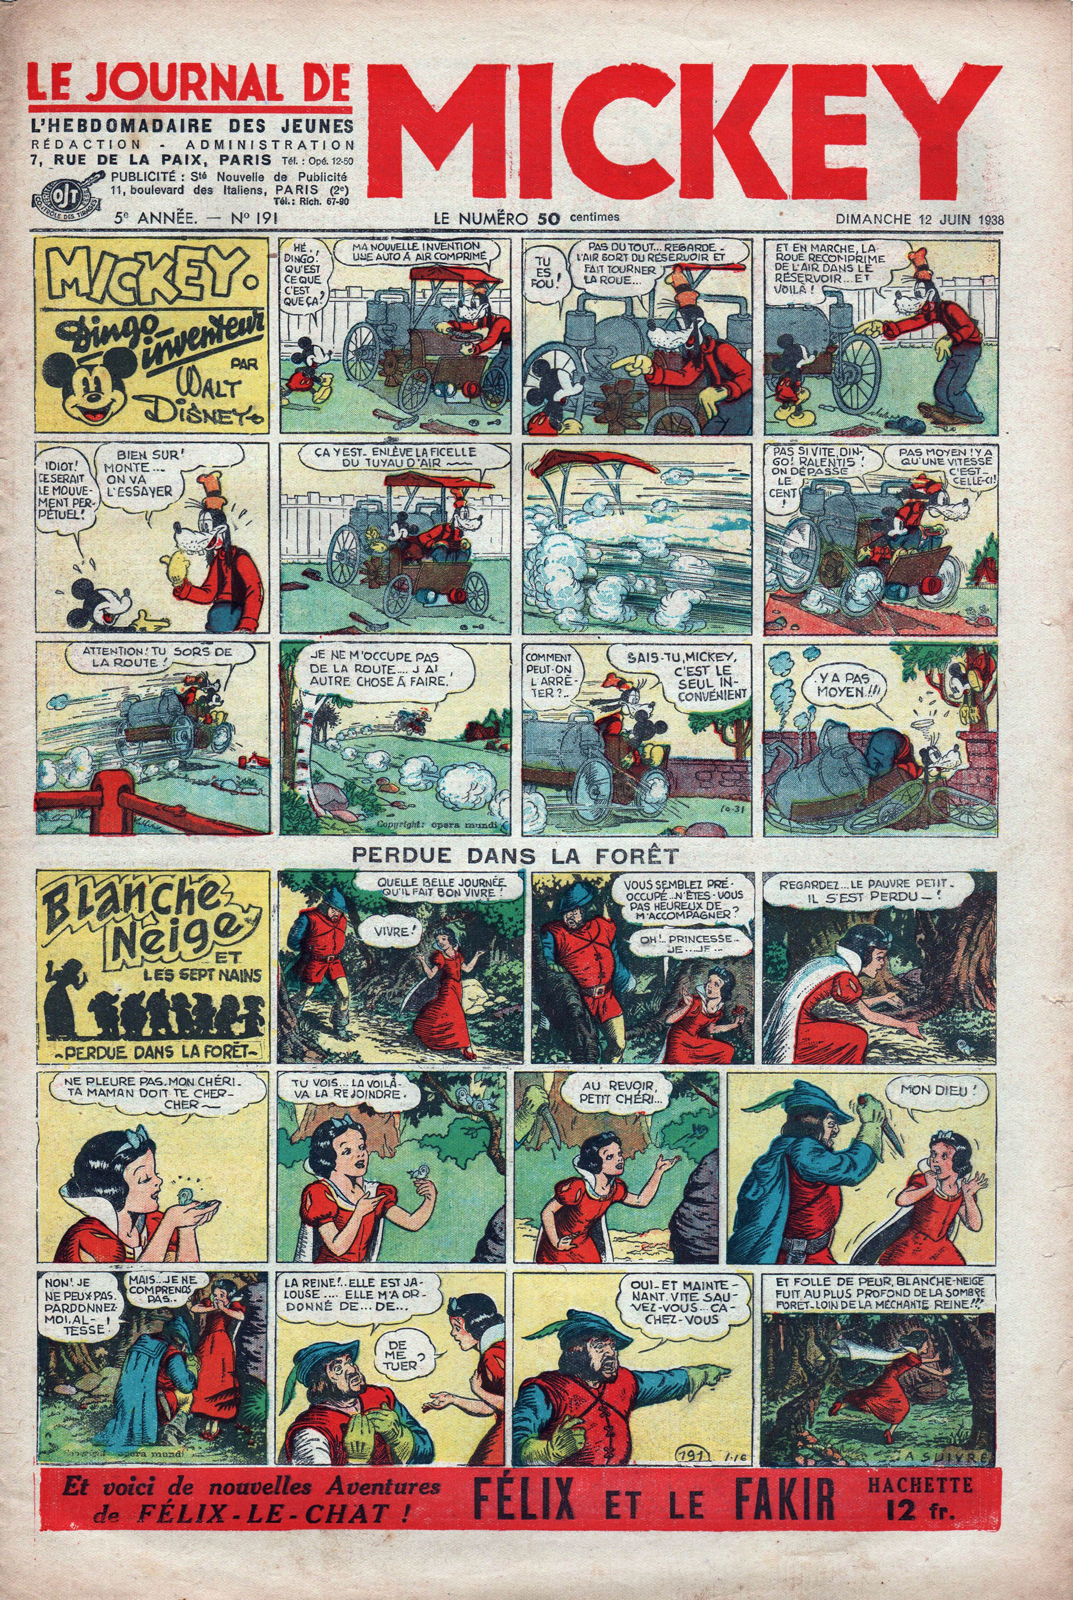 filmic light snow white archive 1938 le journal de mickey blanche neige comic strip. Black Bedroom Furniture Sets. Home Design Ideas